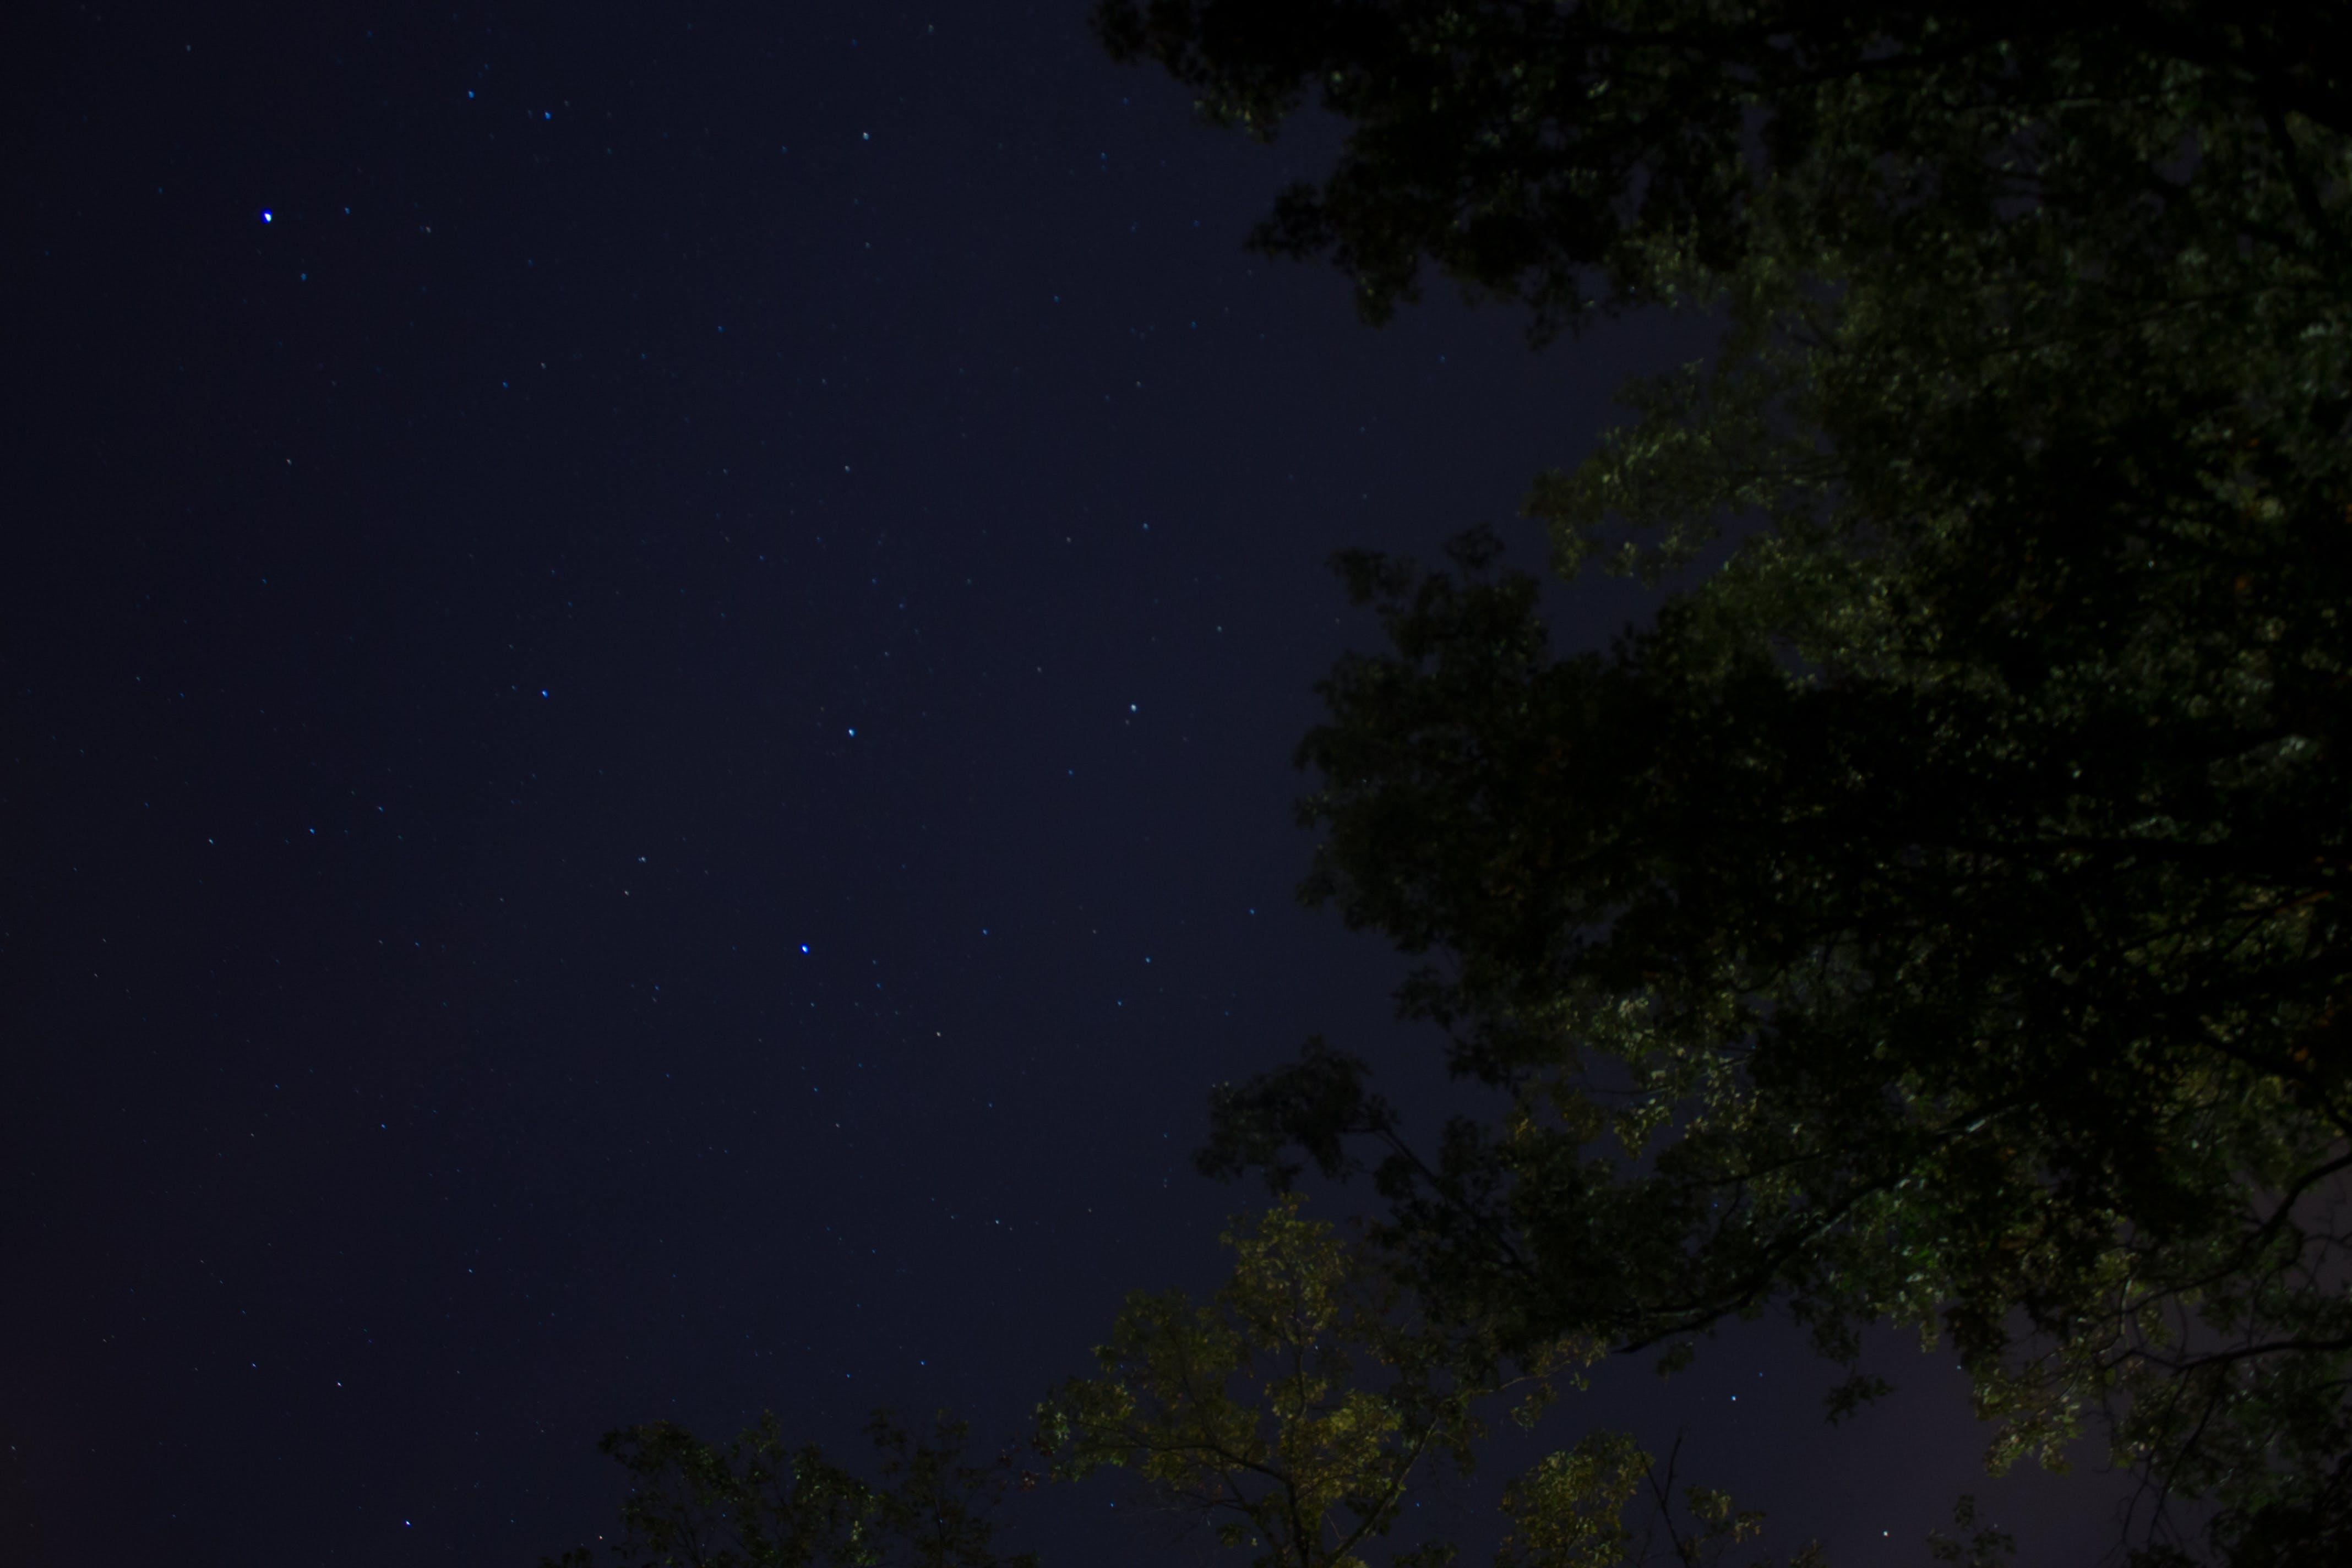 Free stock photo of night sky, stars, suburb, trees